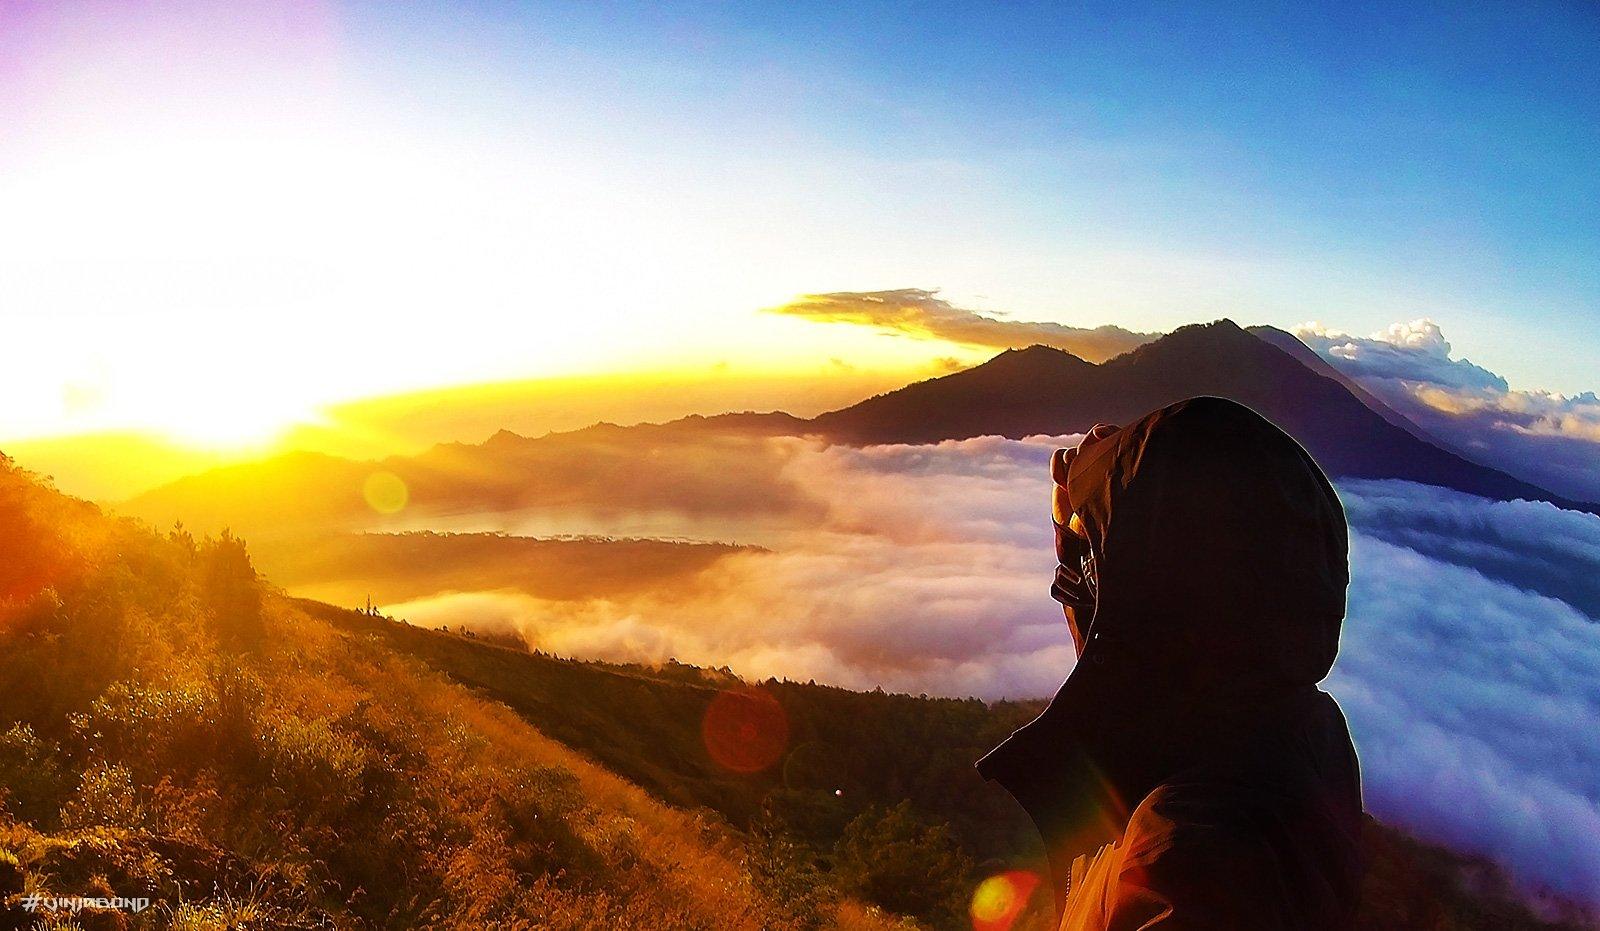 Mount Batur During Sunrise /// Vinjabond